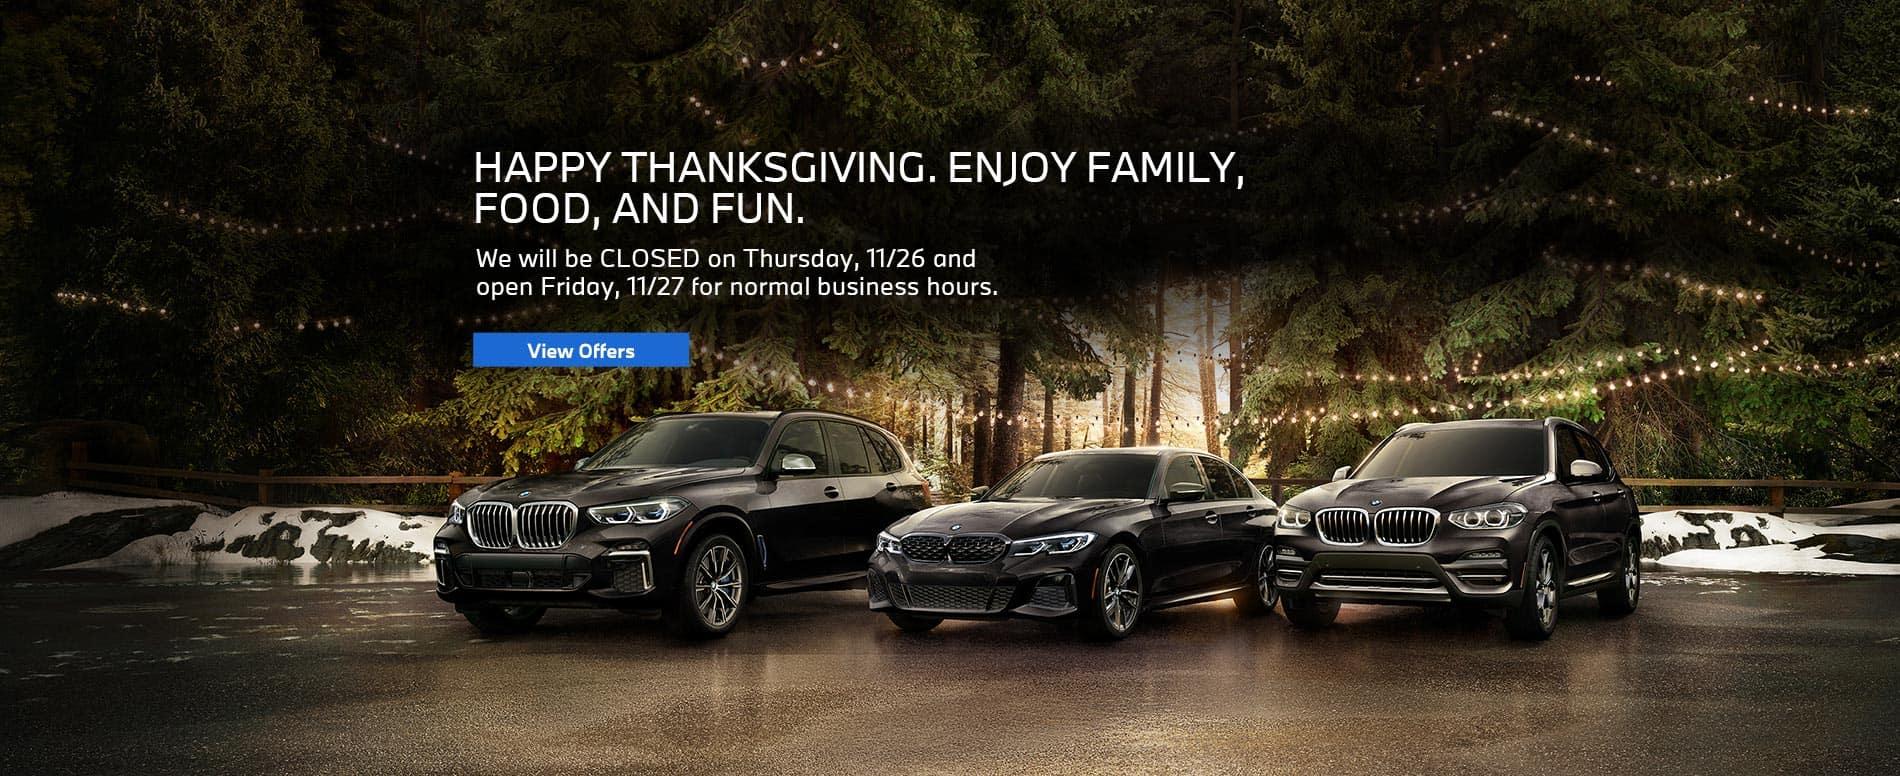 BMW-Nov20-ThanksgivingHours-Banner